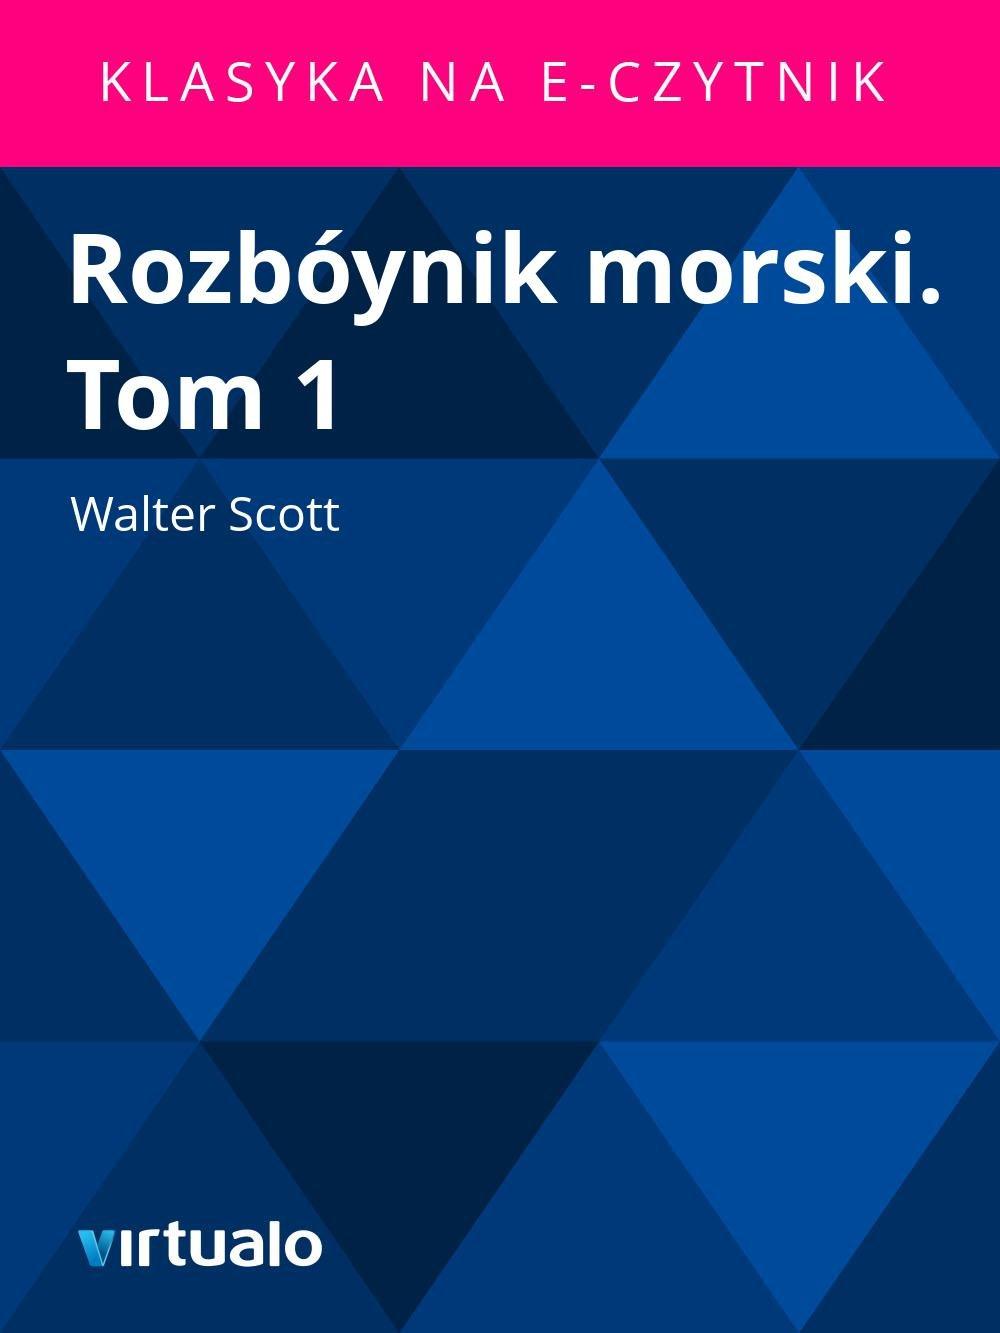 Rozbóynik morski. Tom 1 - Ebook (Książka EPUB) do pobrania w formacie EPUB